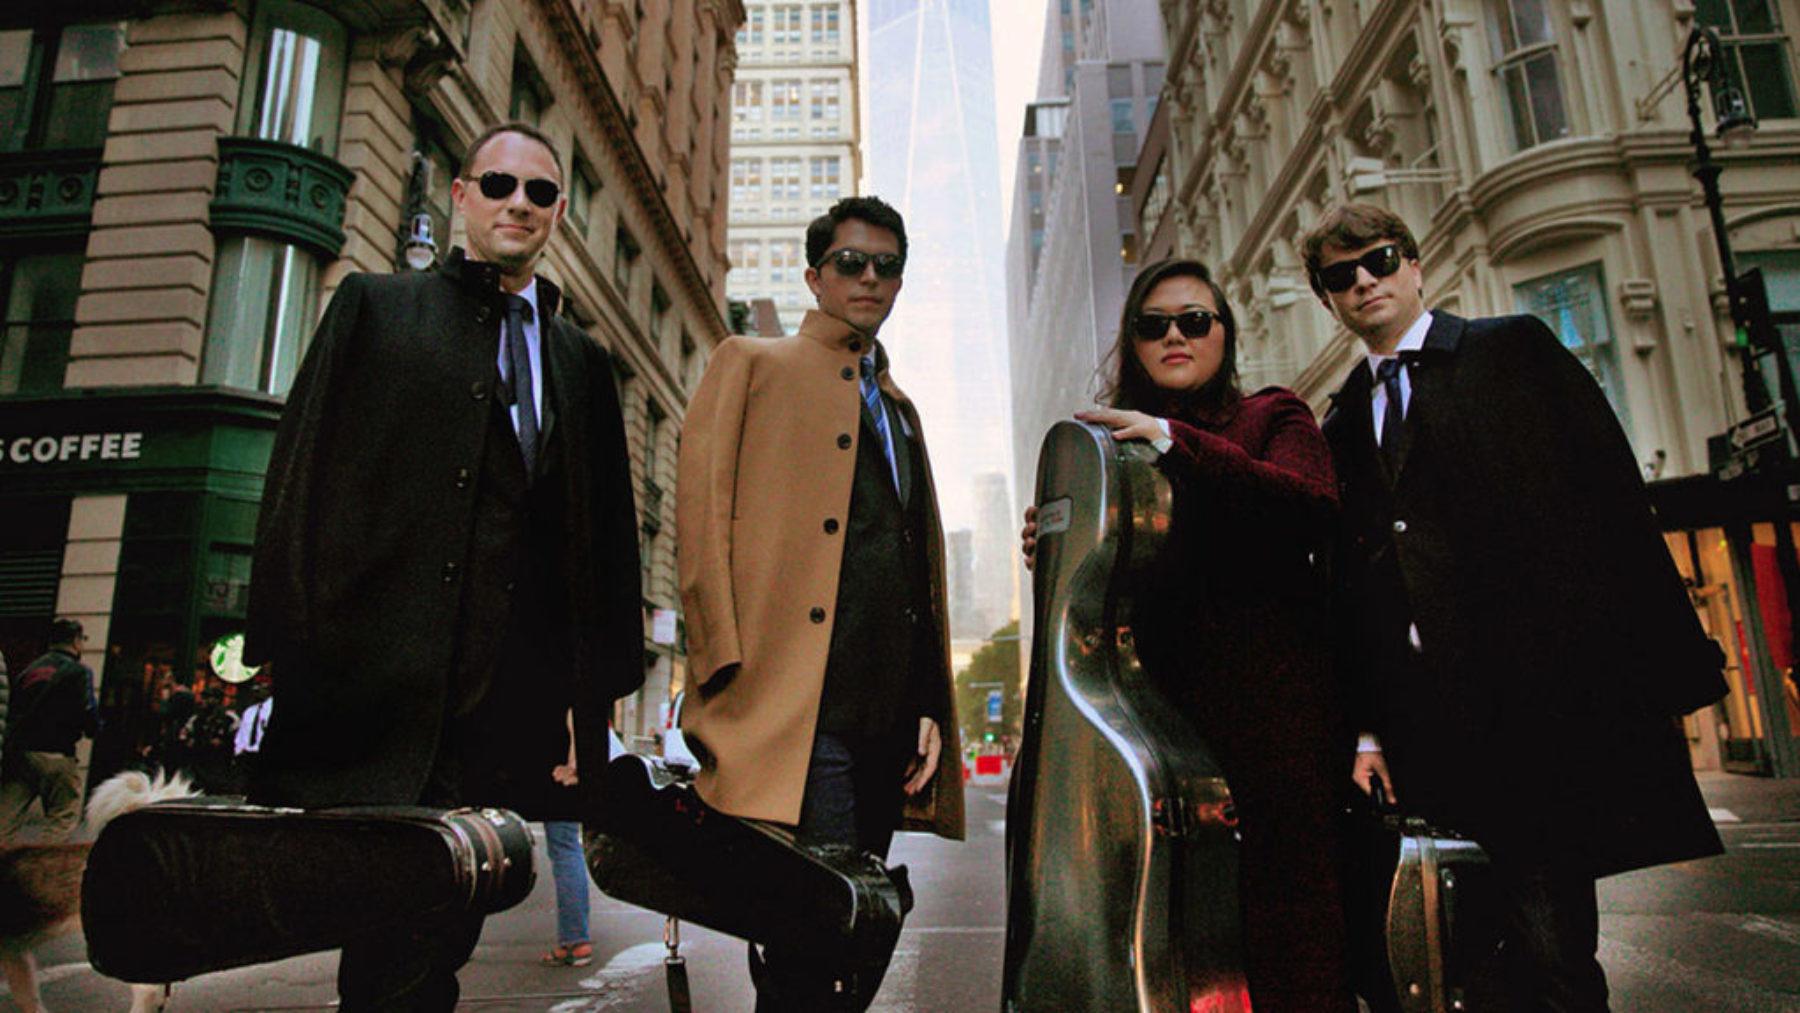 Calidore String Quartet - Saturday, February 29, 2020, 4 pm